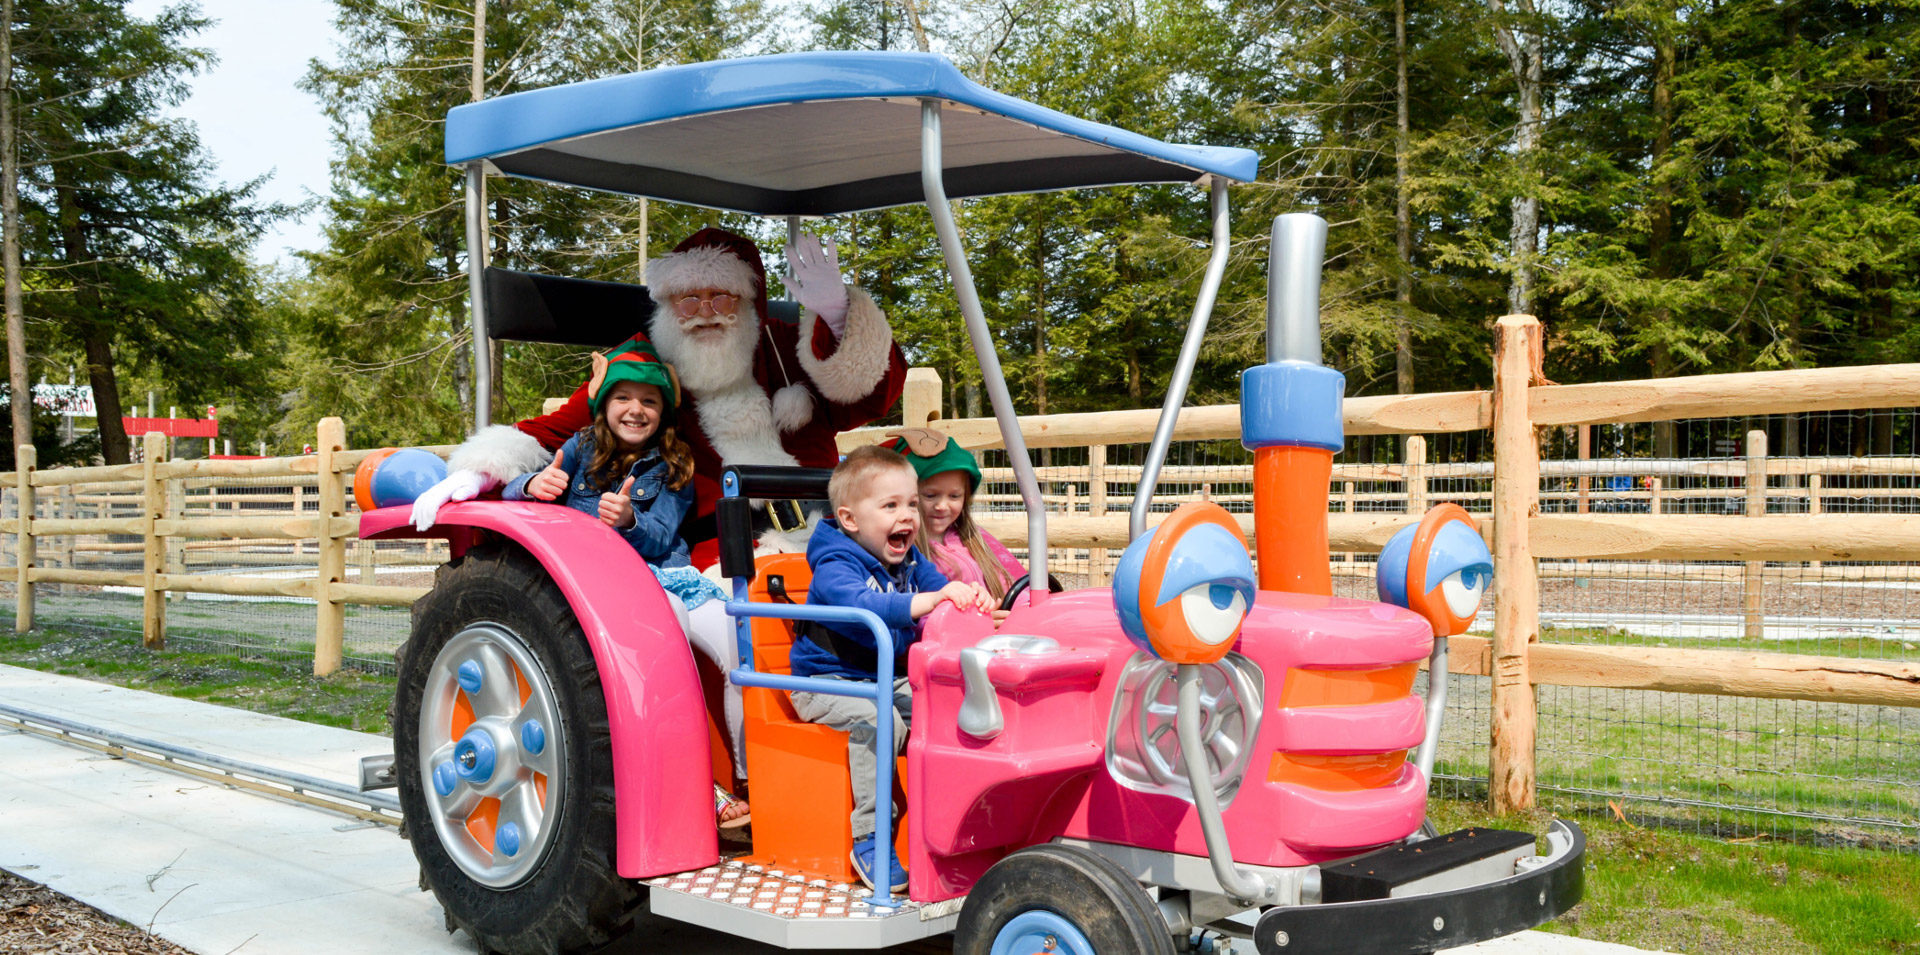 Santa on a ride